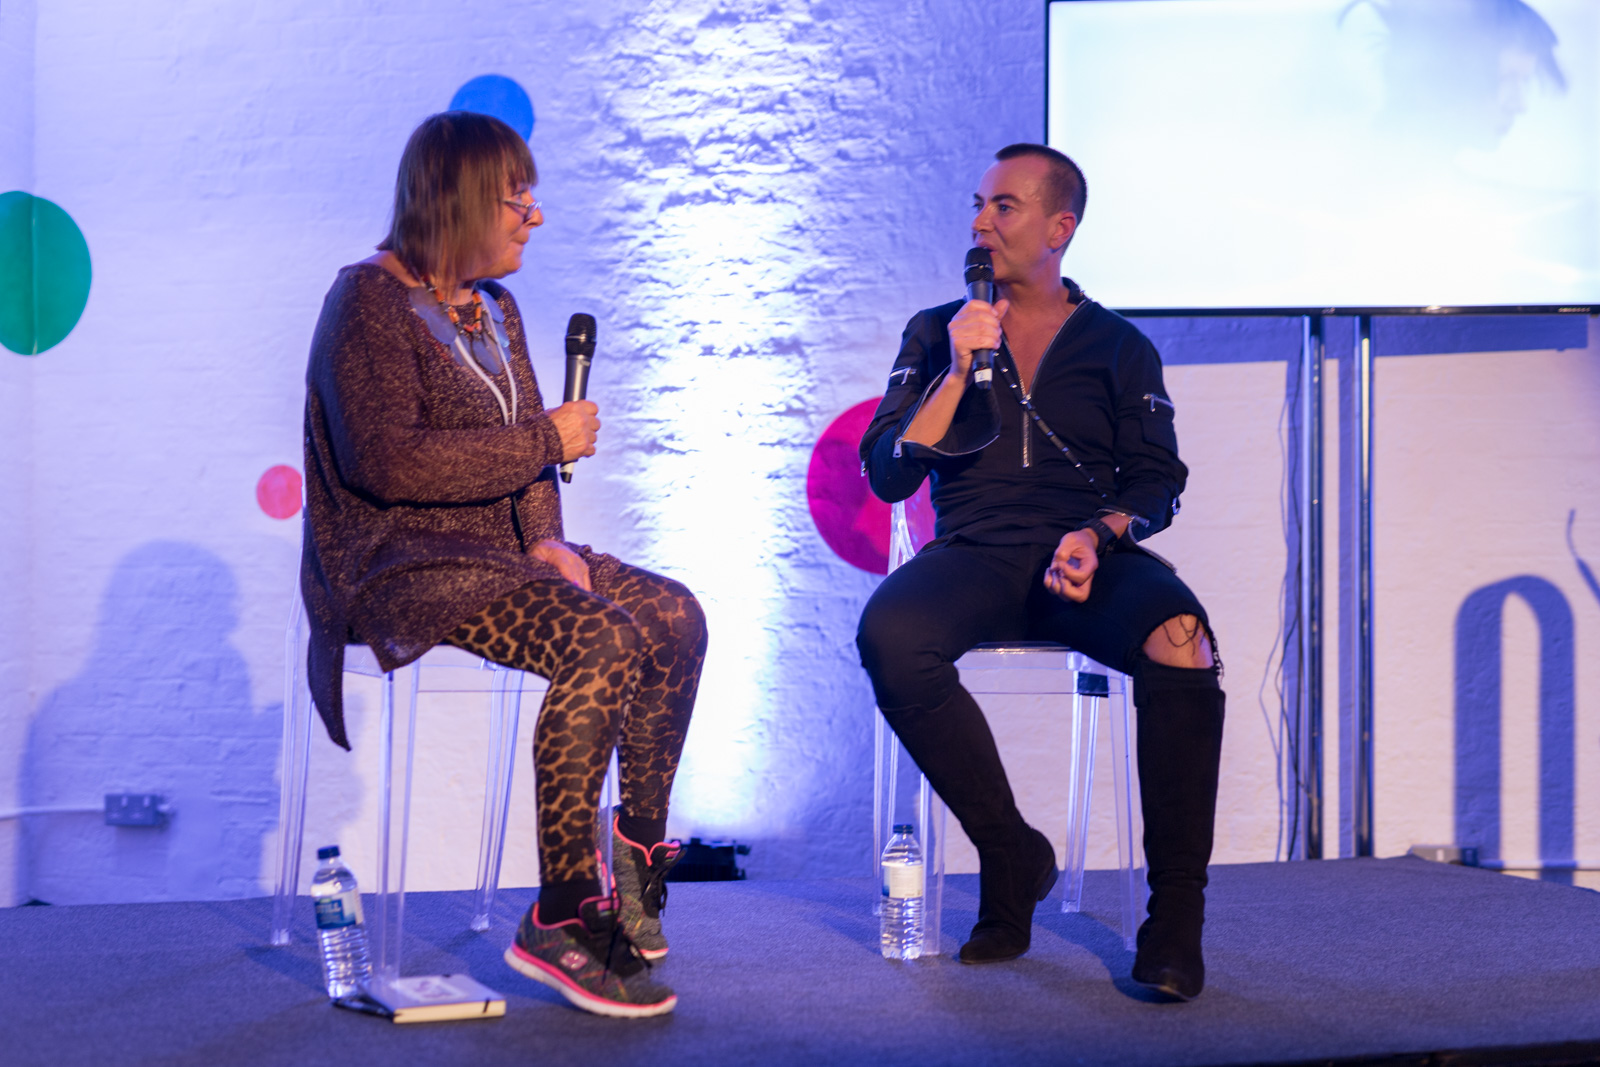 (Julien Macdonald in conversation with Hilary Alexander OBE The career of the King of Glamour by Debenhams) (Debenhams)  (06-06-2017) (image by Qavi Reyez)_.jpg